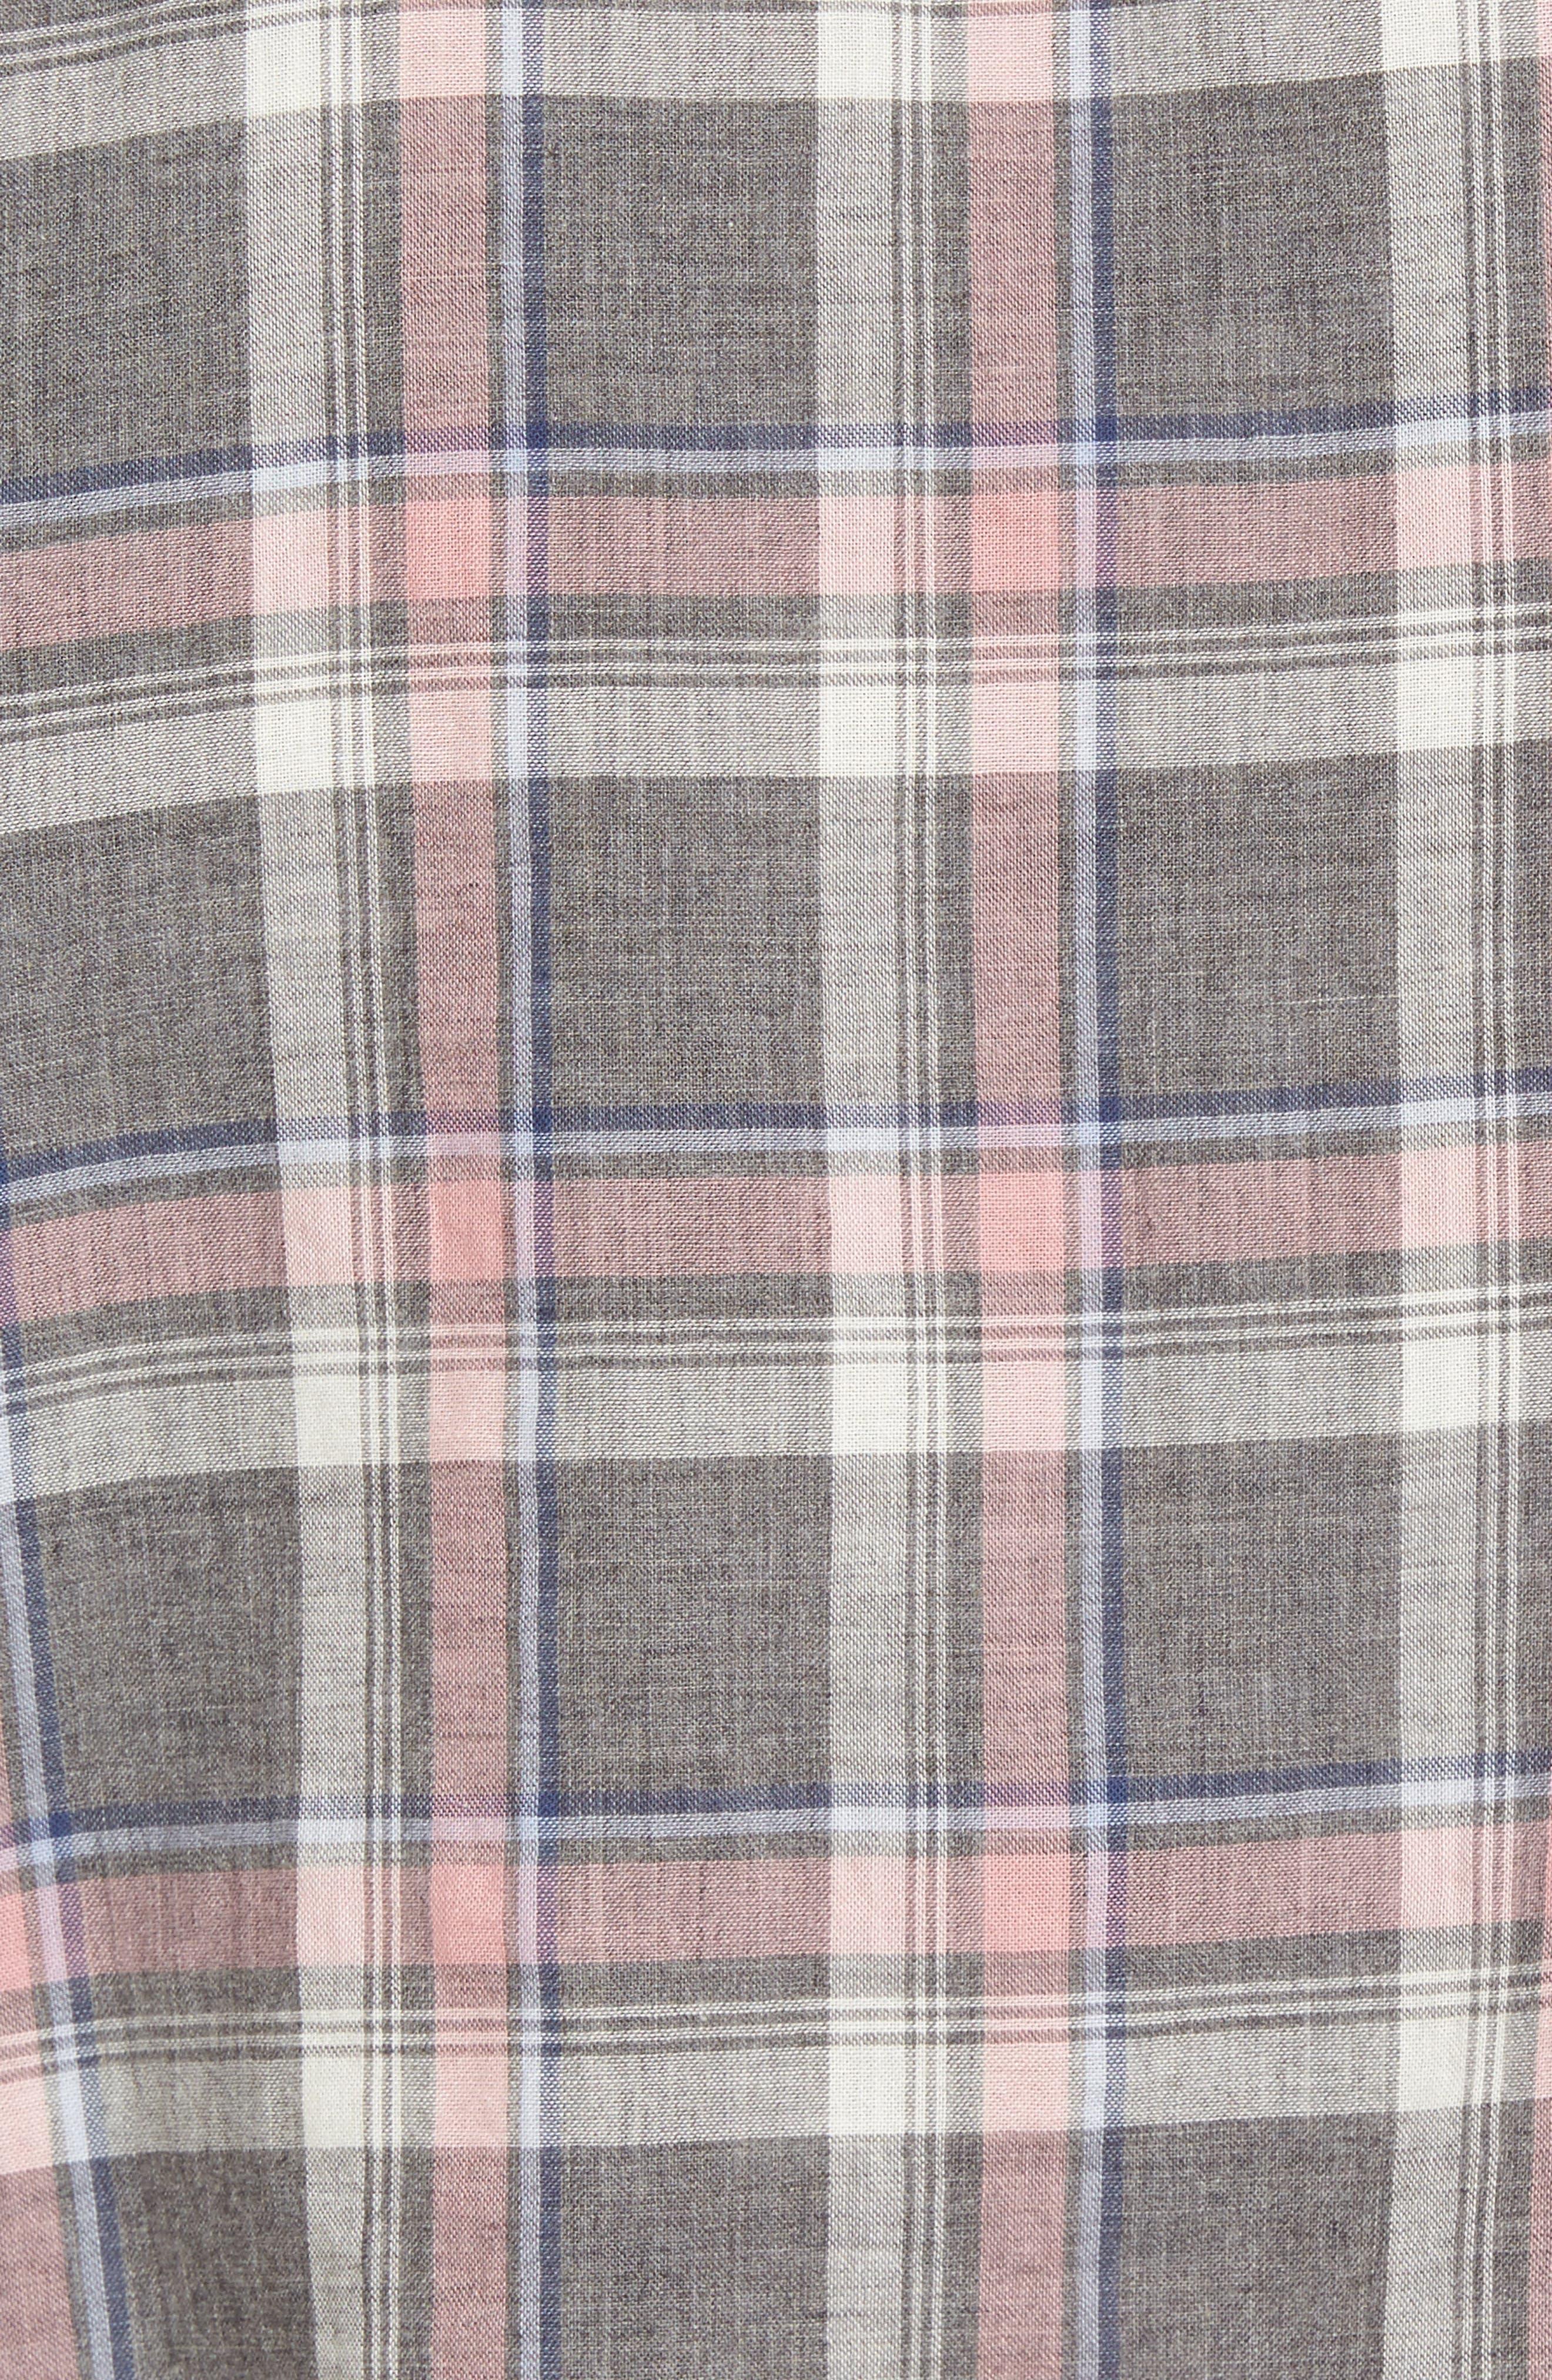 Trim Fit Utility Duofold Sport Shirt,                             Alternate thumbnail 5, color,                             Grey Paloma Pink Plaid Duofold